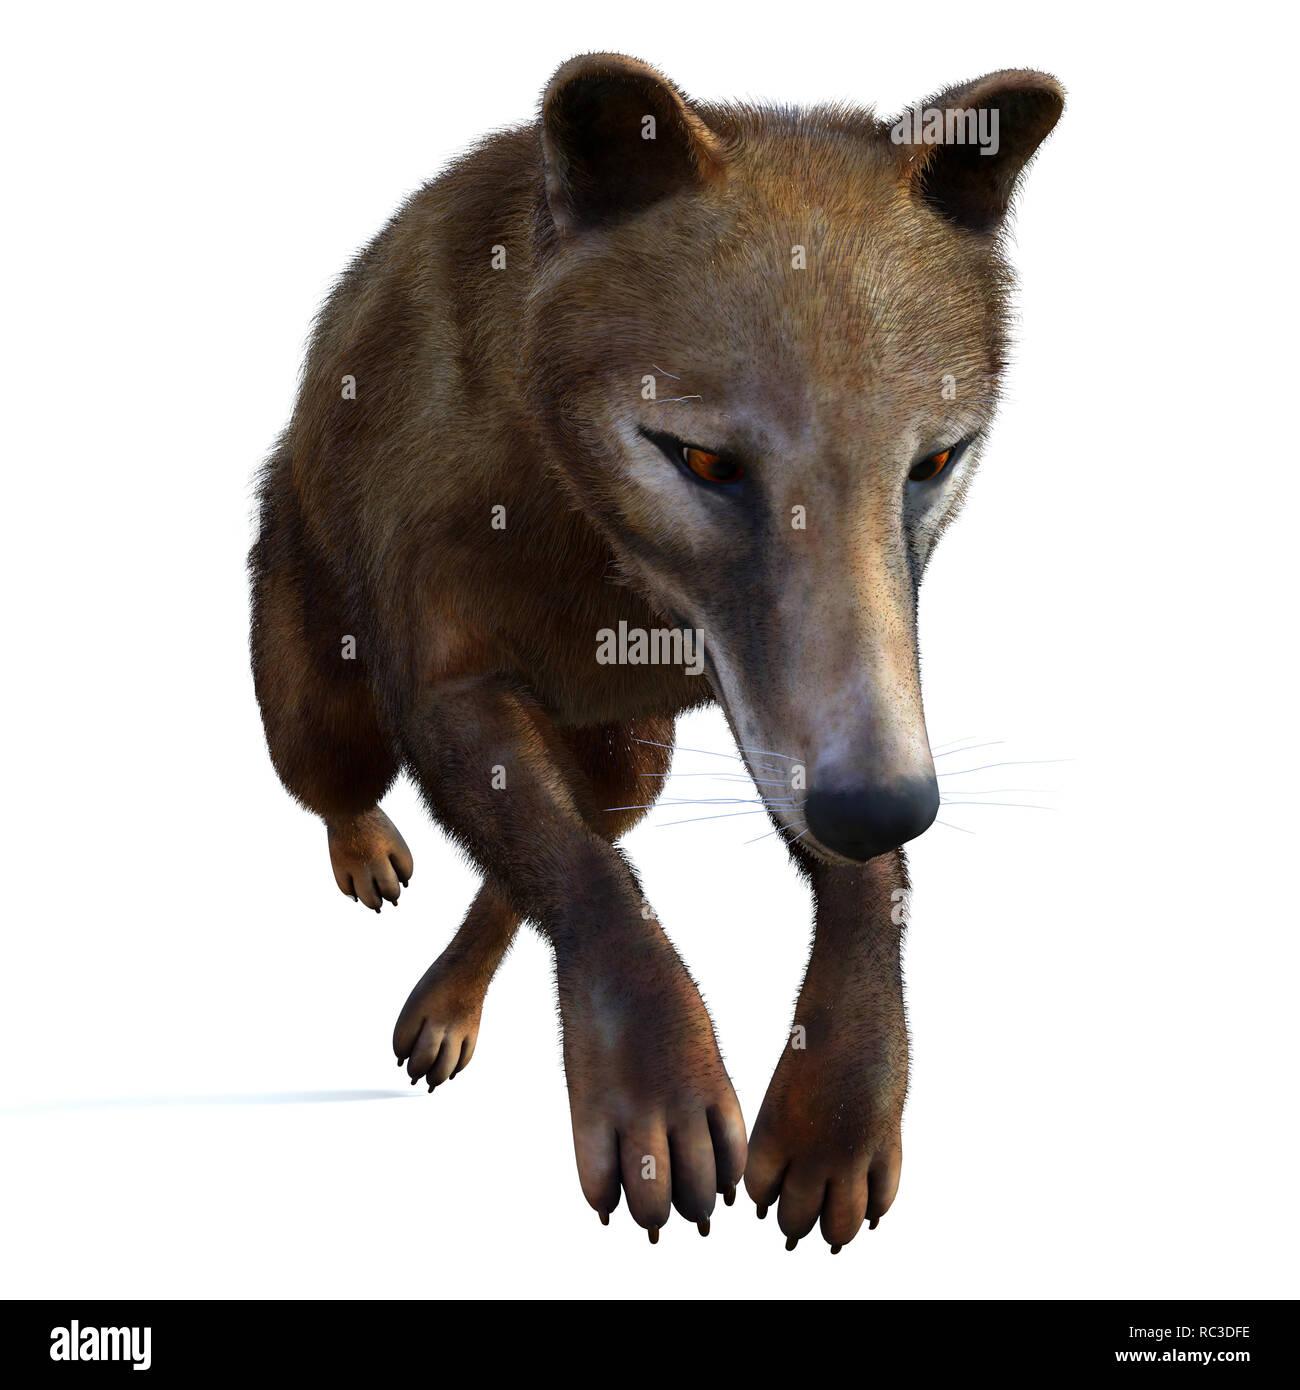 Thylacine Marsupial - The Thylacine marsupial was an extinct predator from the Holocene Period of Australia, Tasmania, and New Guinea. - Stock Image